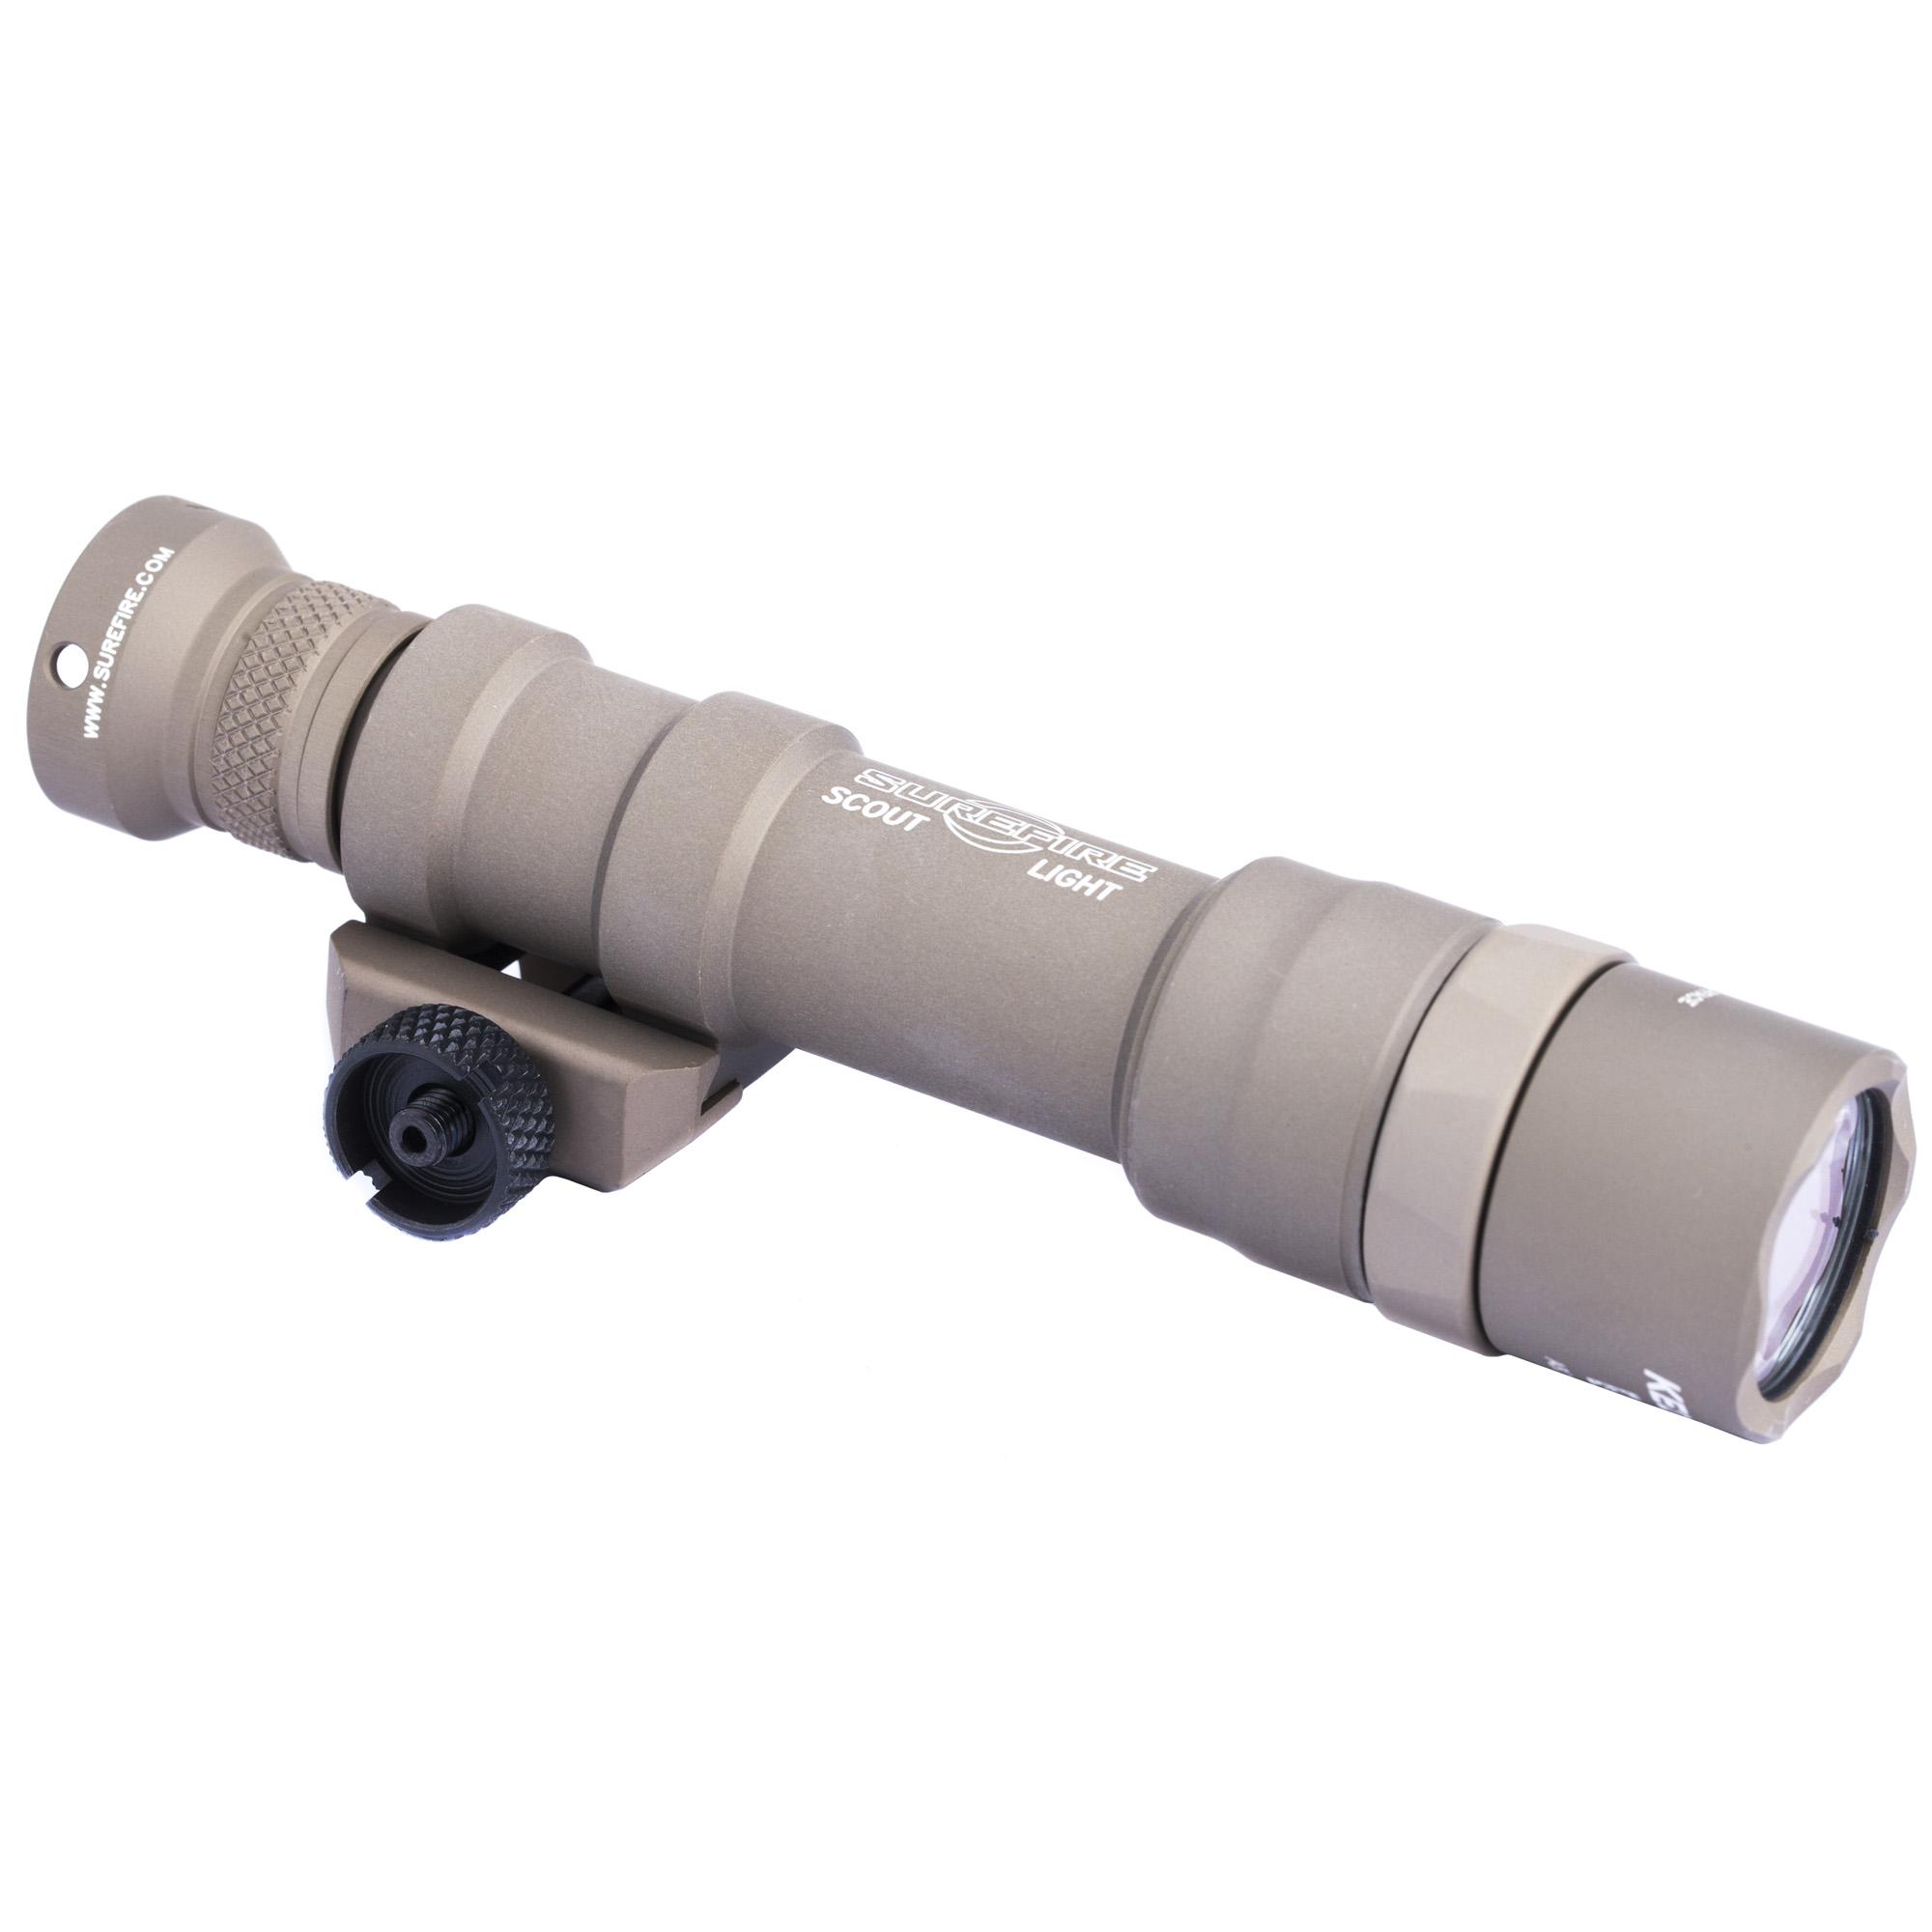 SFM600DF-TN_4_HR